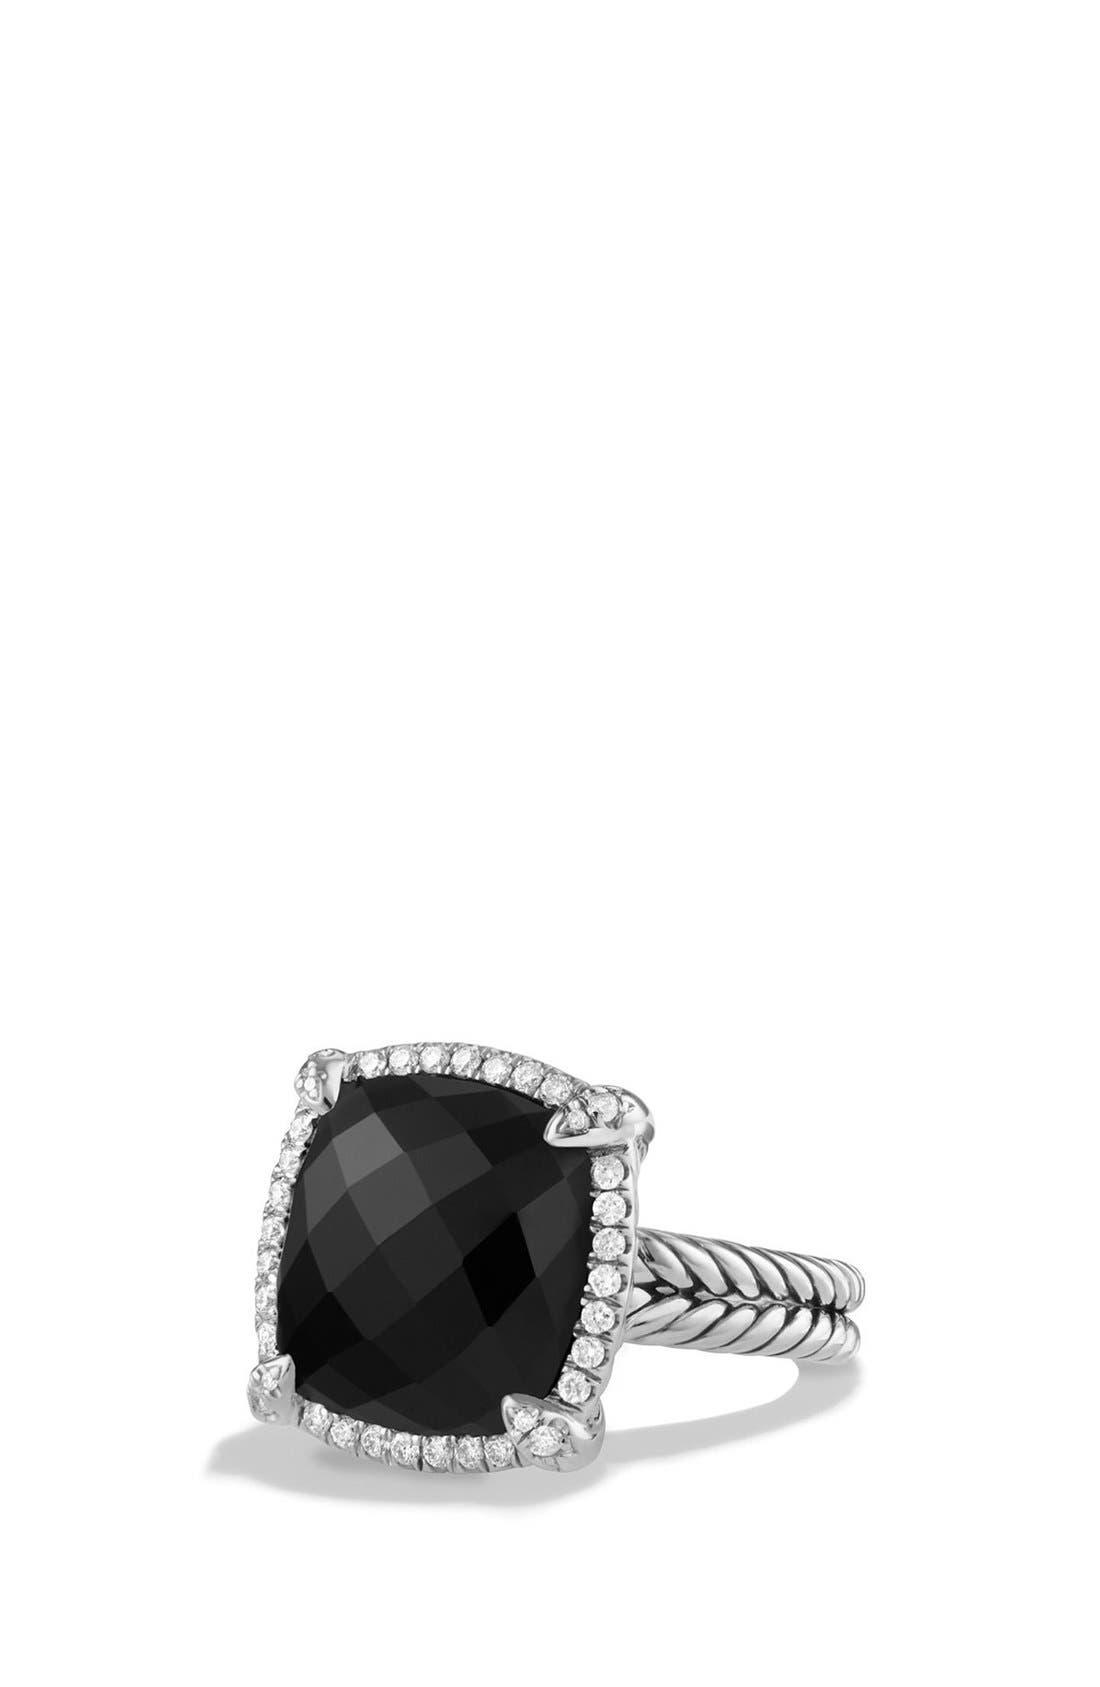 Alternate Image 1 Selected - David Yurman 'Châtelaine' Large Pavé Bezel Ring with Diamonds